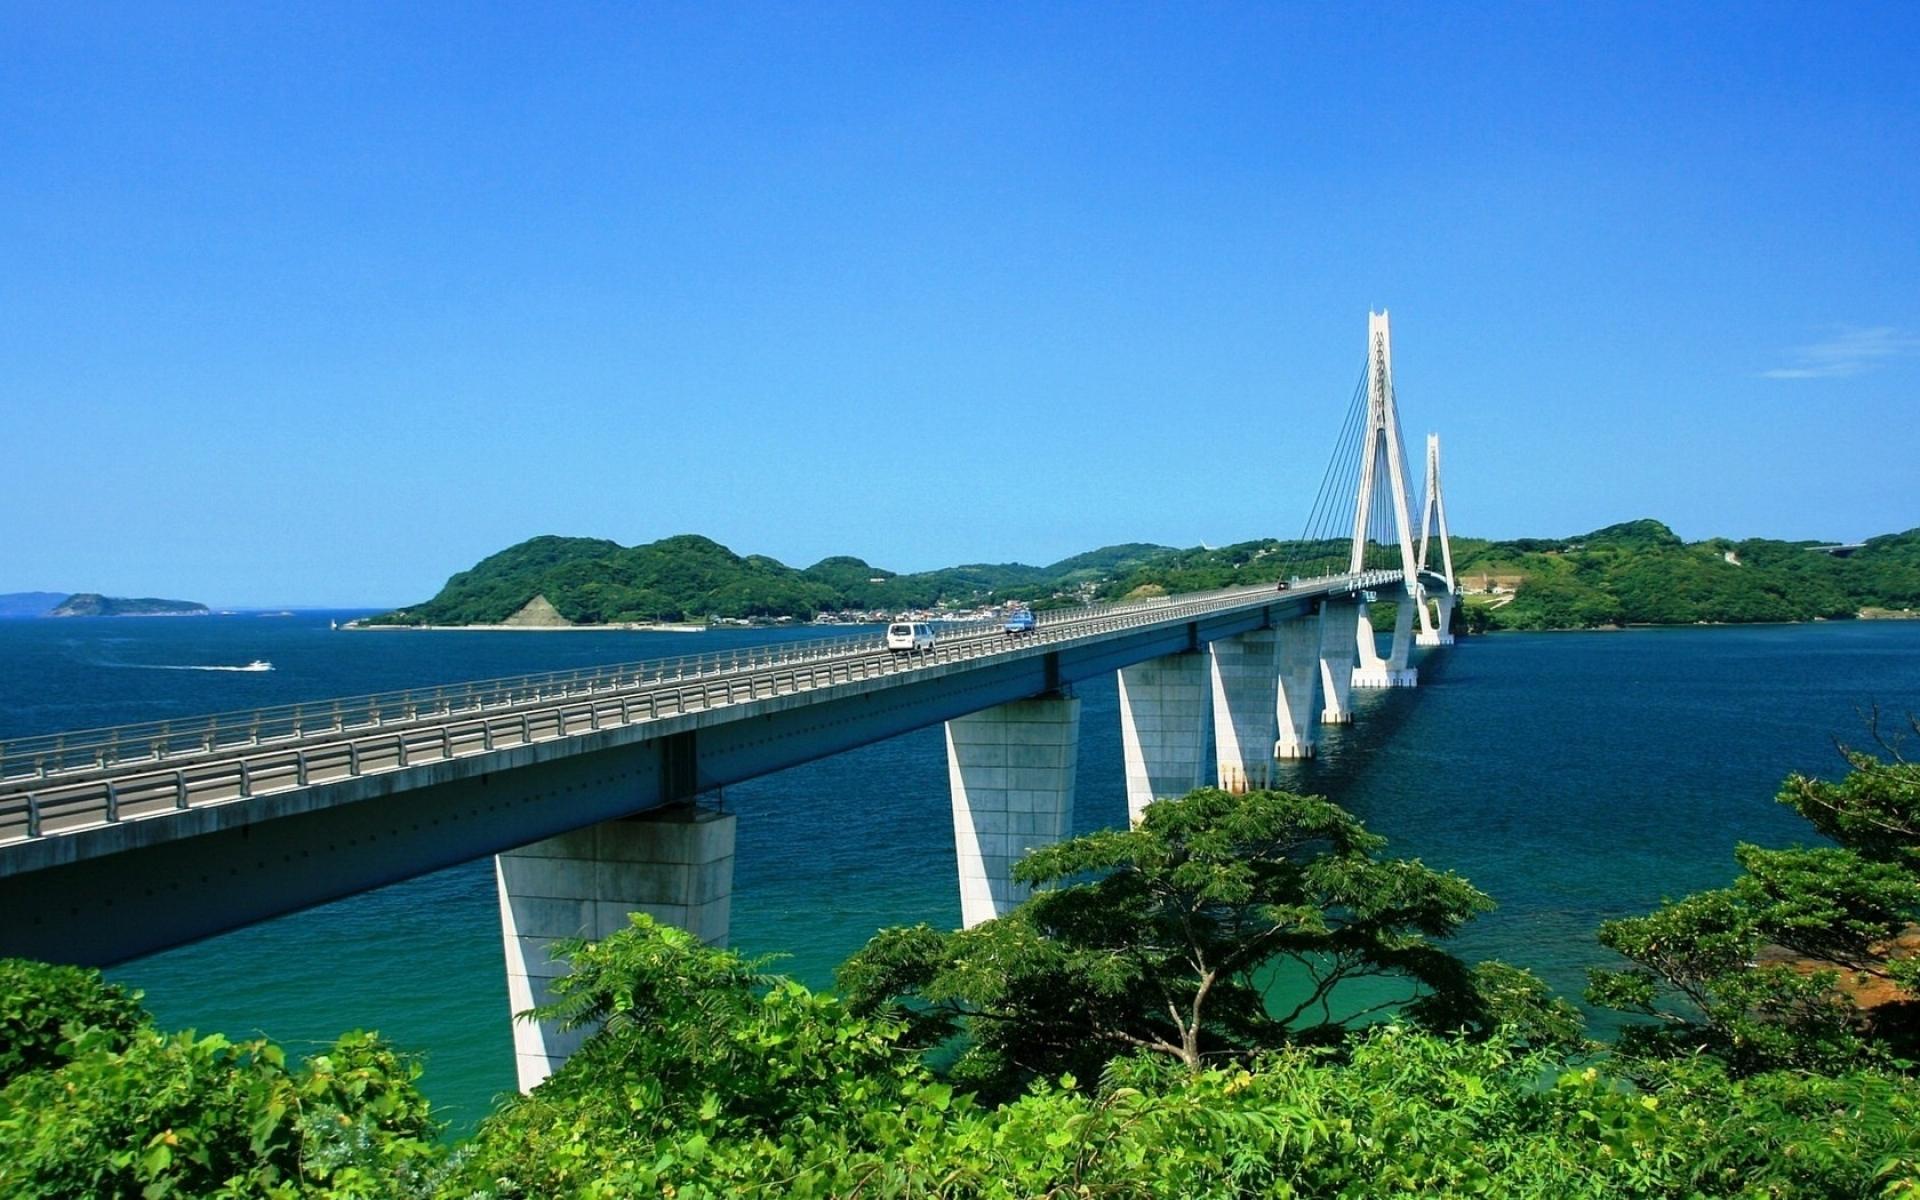 природа страны архитектура река мост Александр без смс